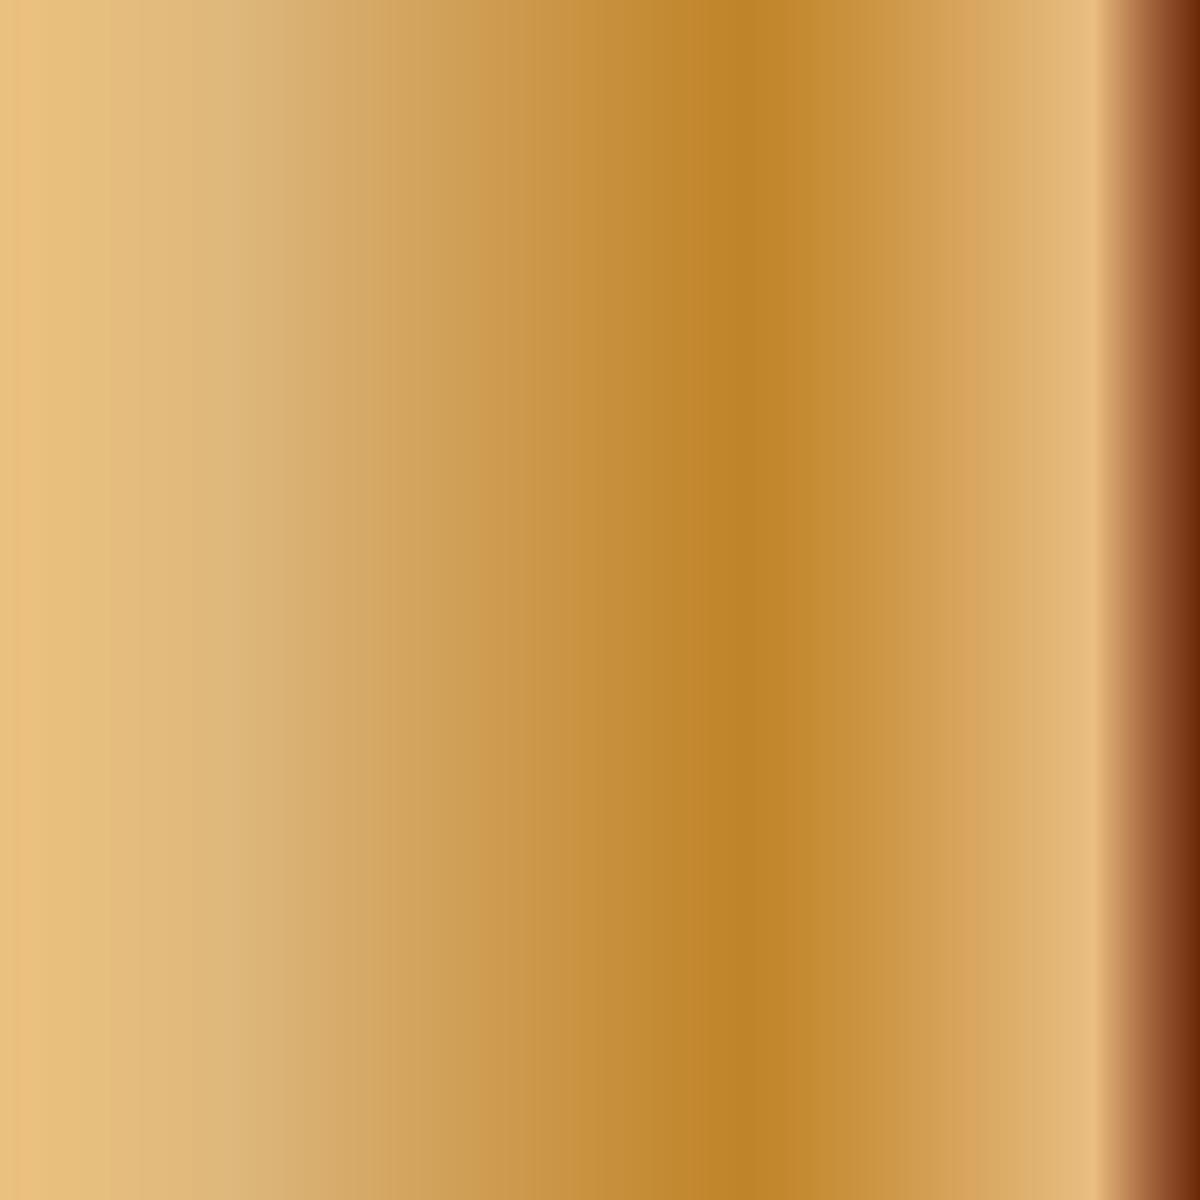 FolkArt ® Brushed Metal™ Acrylic Paint - Antique Gold, 2 oz. - 5122